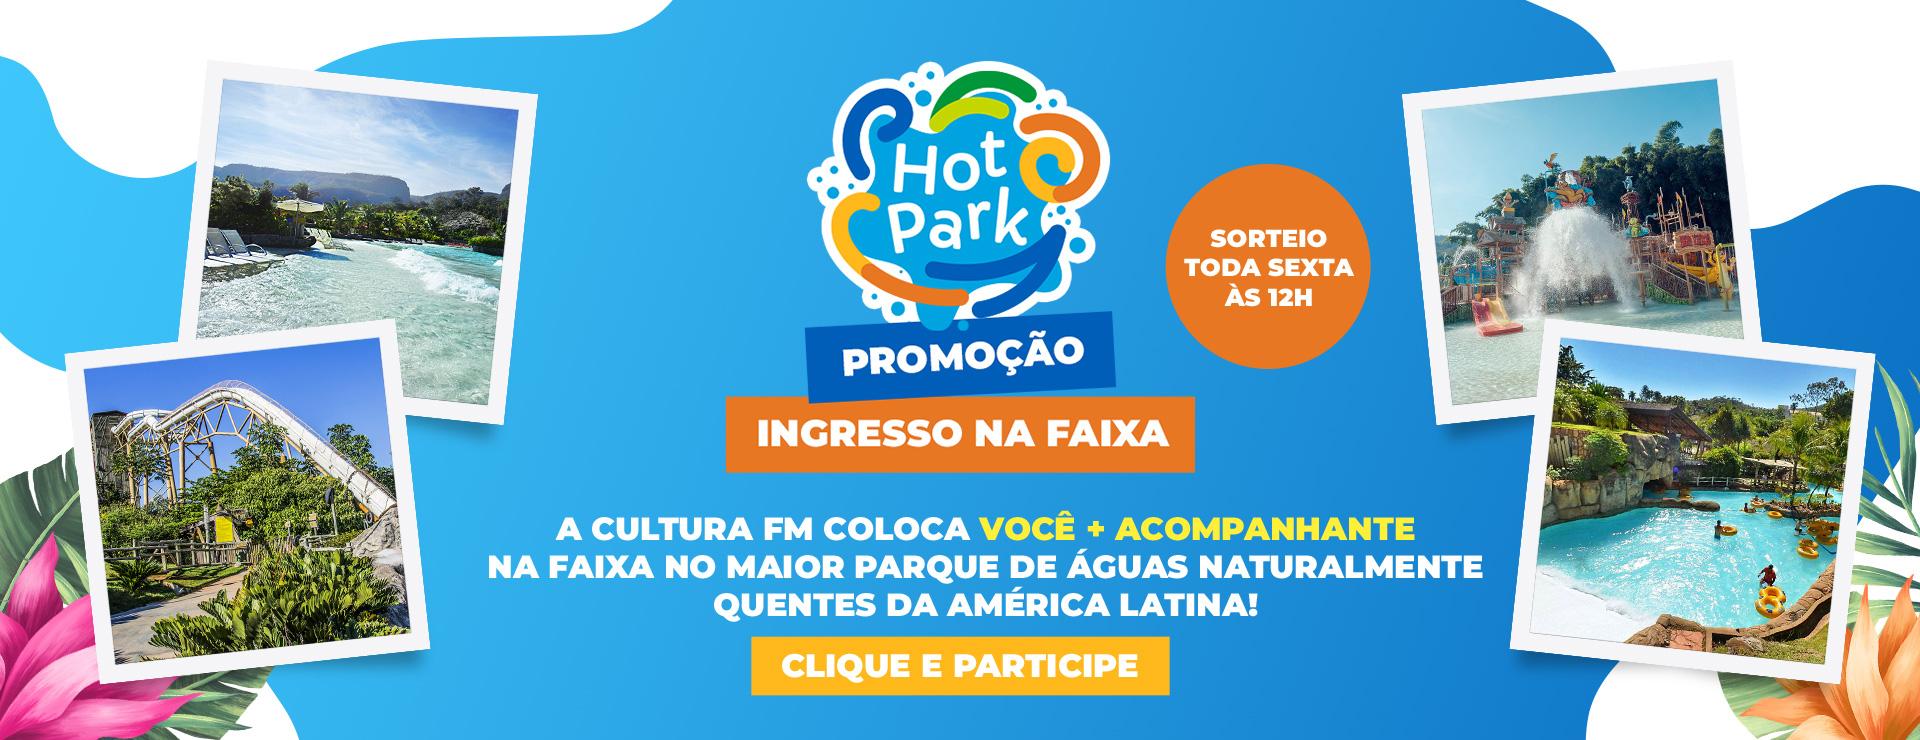 Hot Park